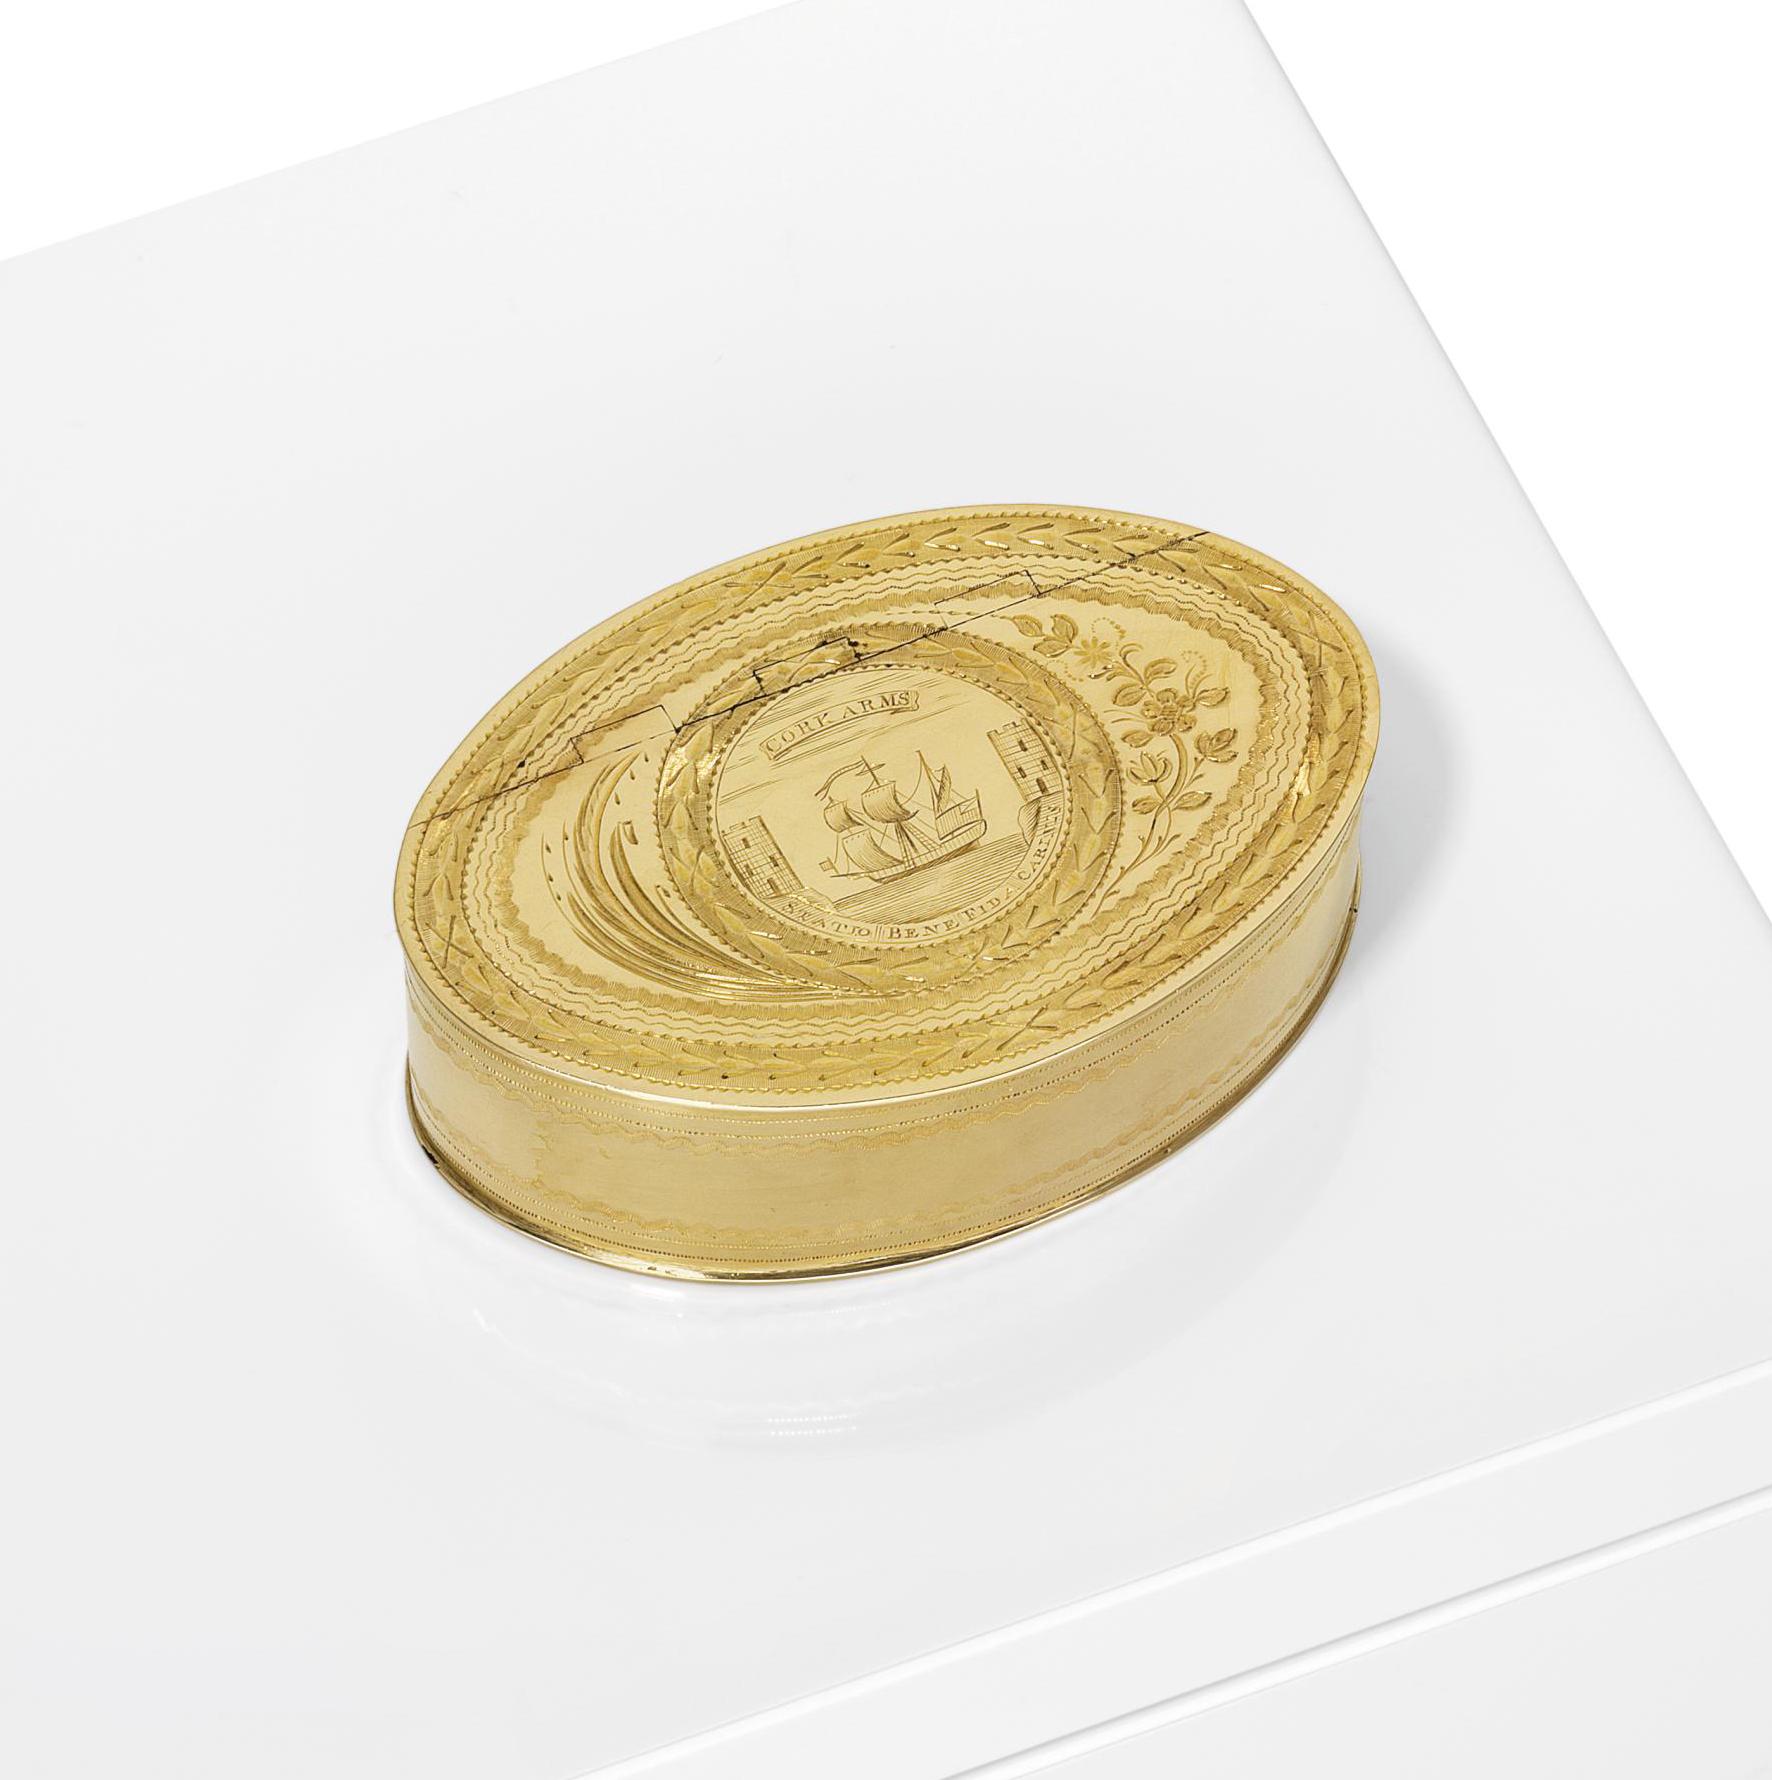 A GEORGE III IRISH GOLD FREEDOM BOX